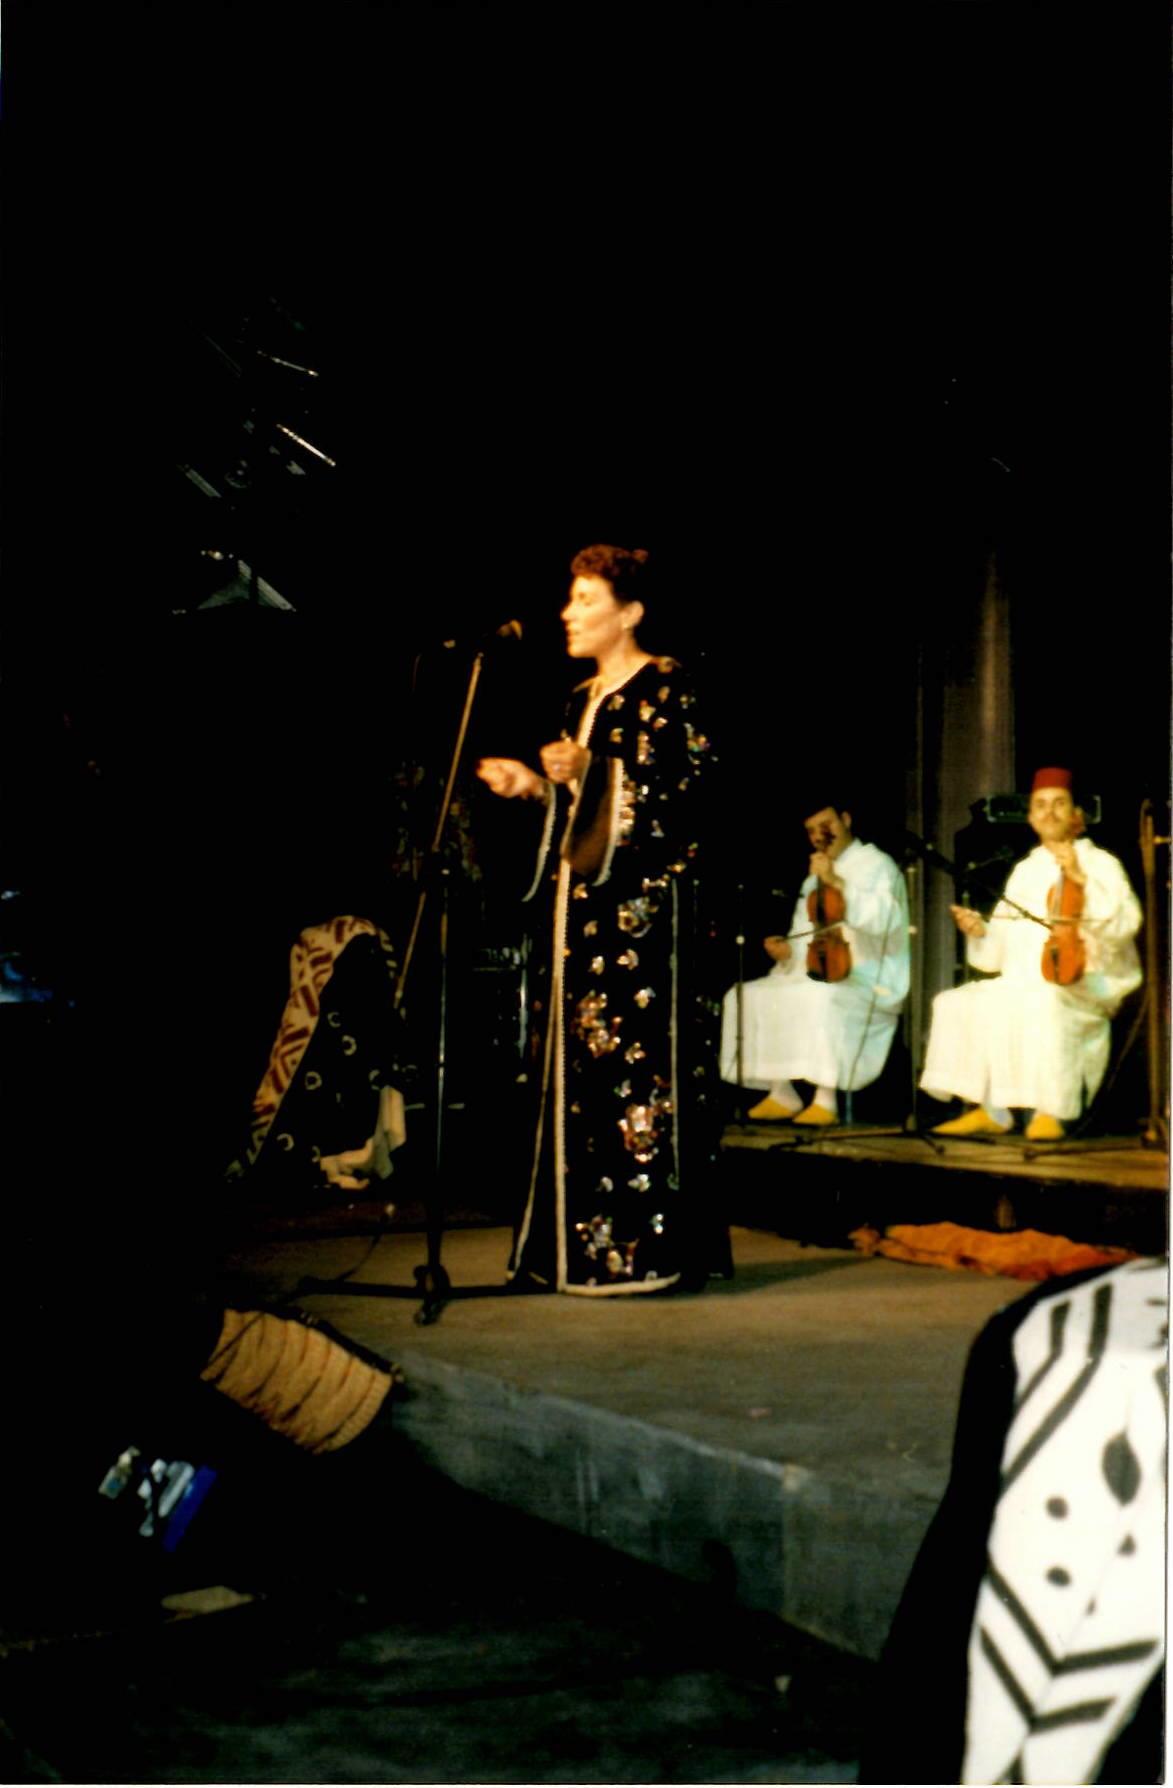 Touria Hadraoui